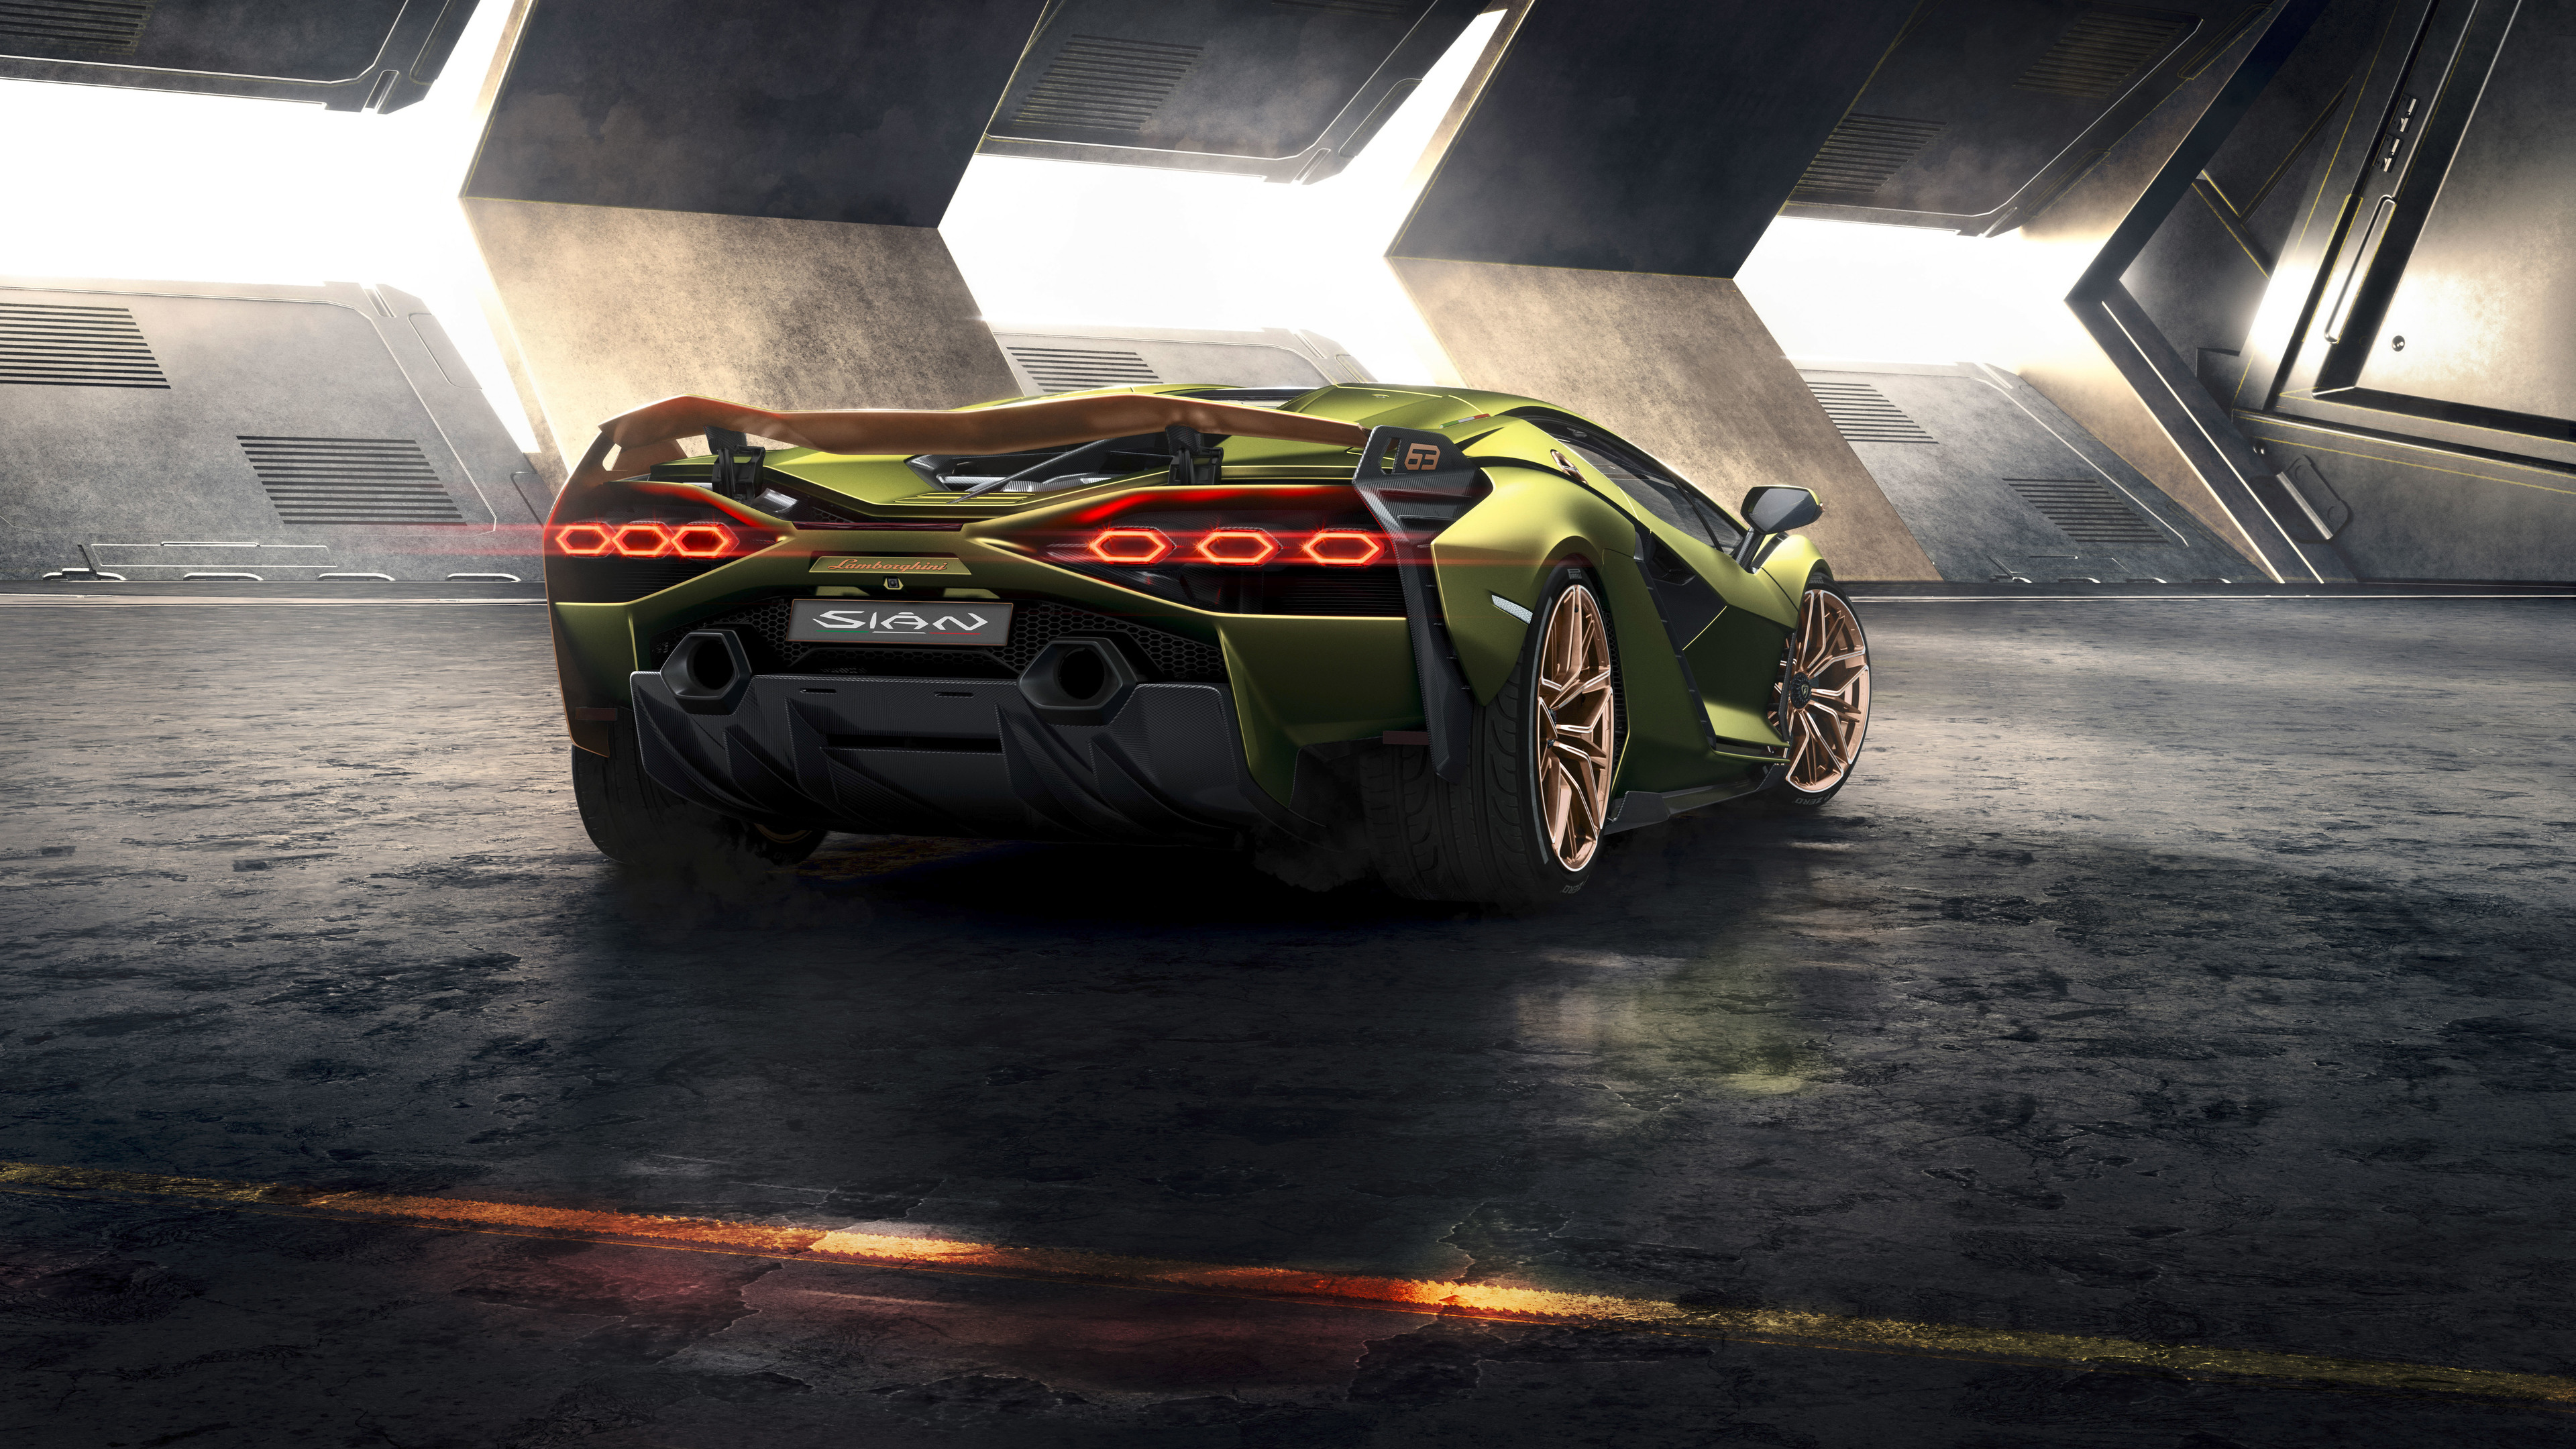 2019 lamborghini sian rear 1569189552 - 2019 Lamborghini Sian Rear - lamborghini wallpapers, lamborghini sian wallpapers, hd-wallpapers, cars wallpapers, 8k wallpapers, 5k wallpapers, 4k-wallpapers, 2019 cars wallpapers